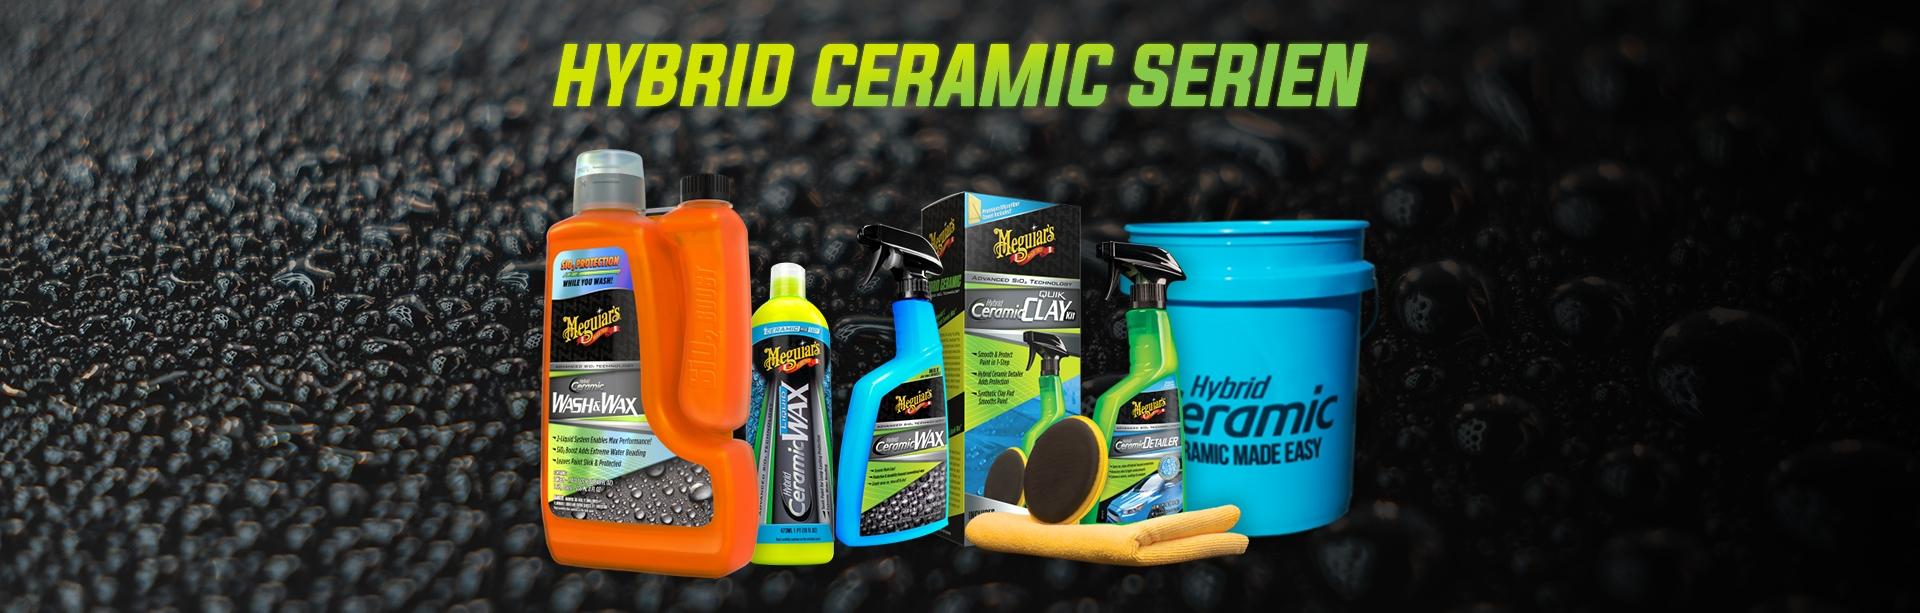 Hybrid Ceramic Serien